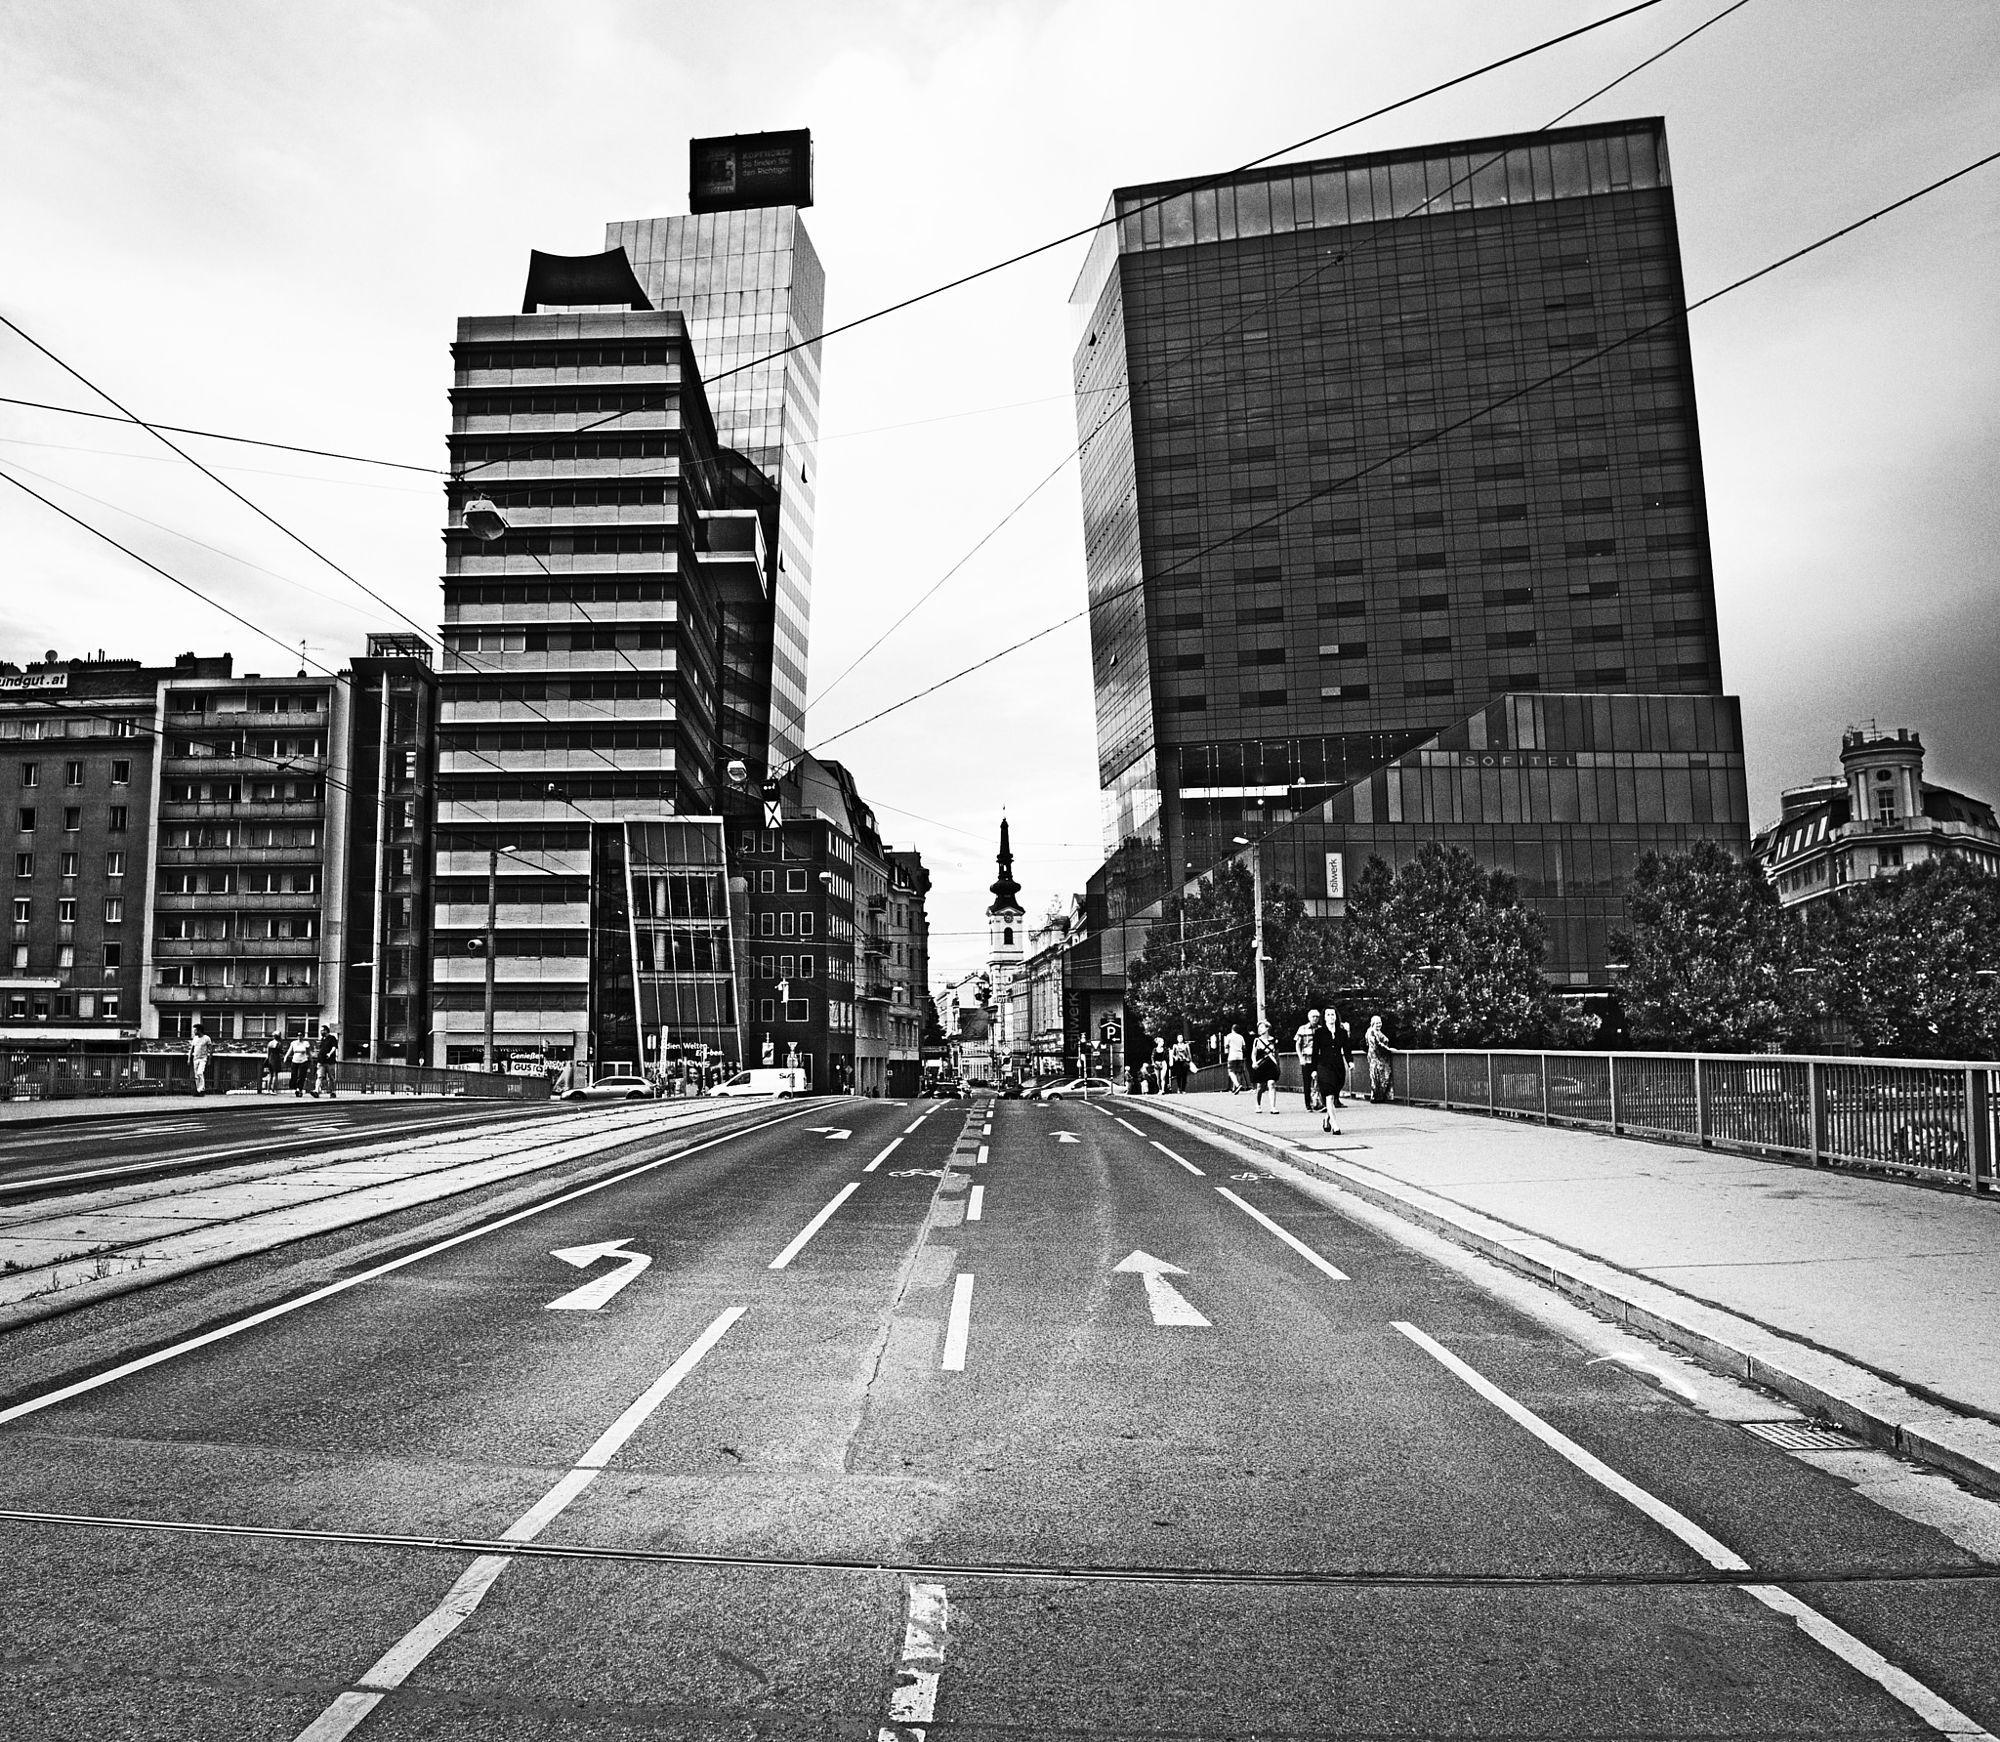 Urban Exploration: Arche by LeQuidam https://t.co/aQkYFvhNZ2   #500px #photography #photos https://t.co/1NYvKK8QjC #followme #photography